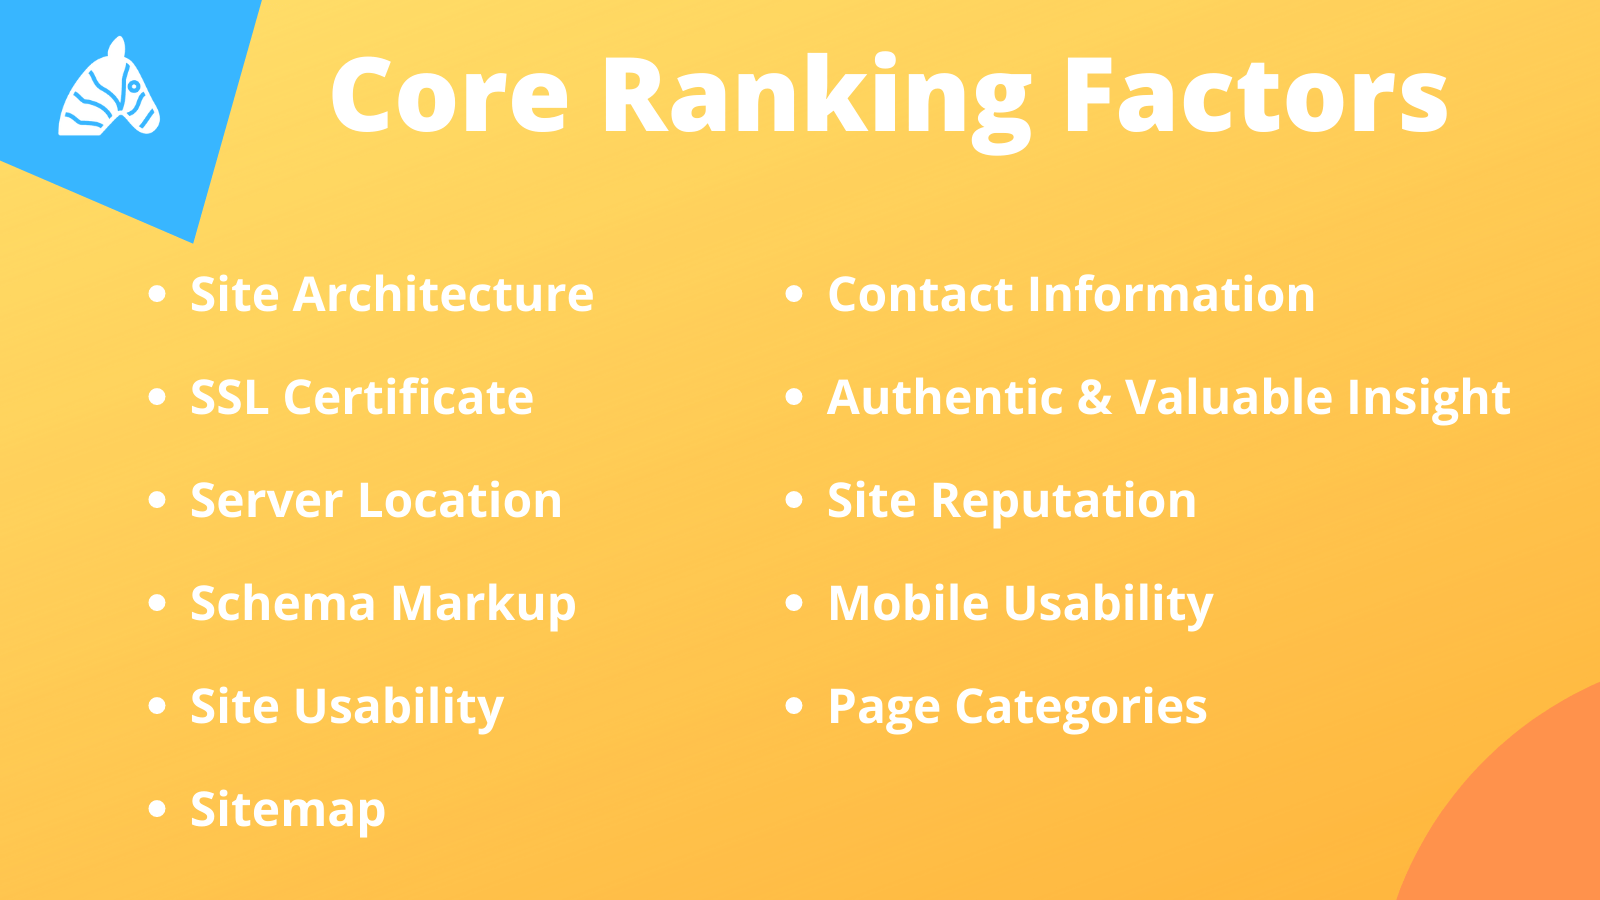 core ranking factors 2020